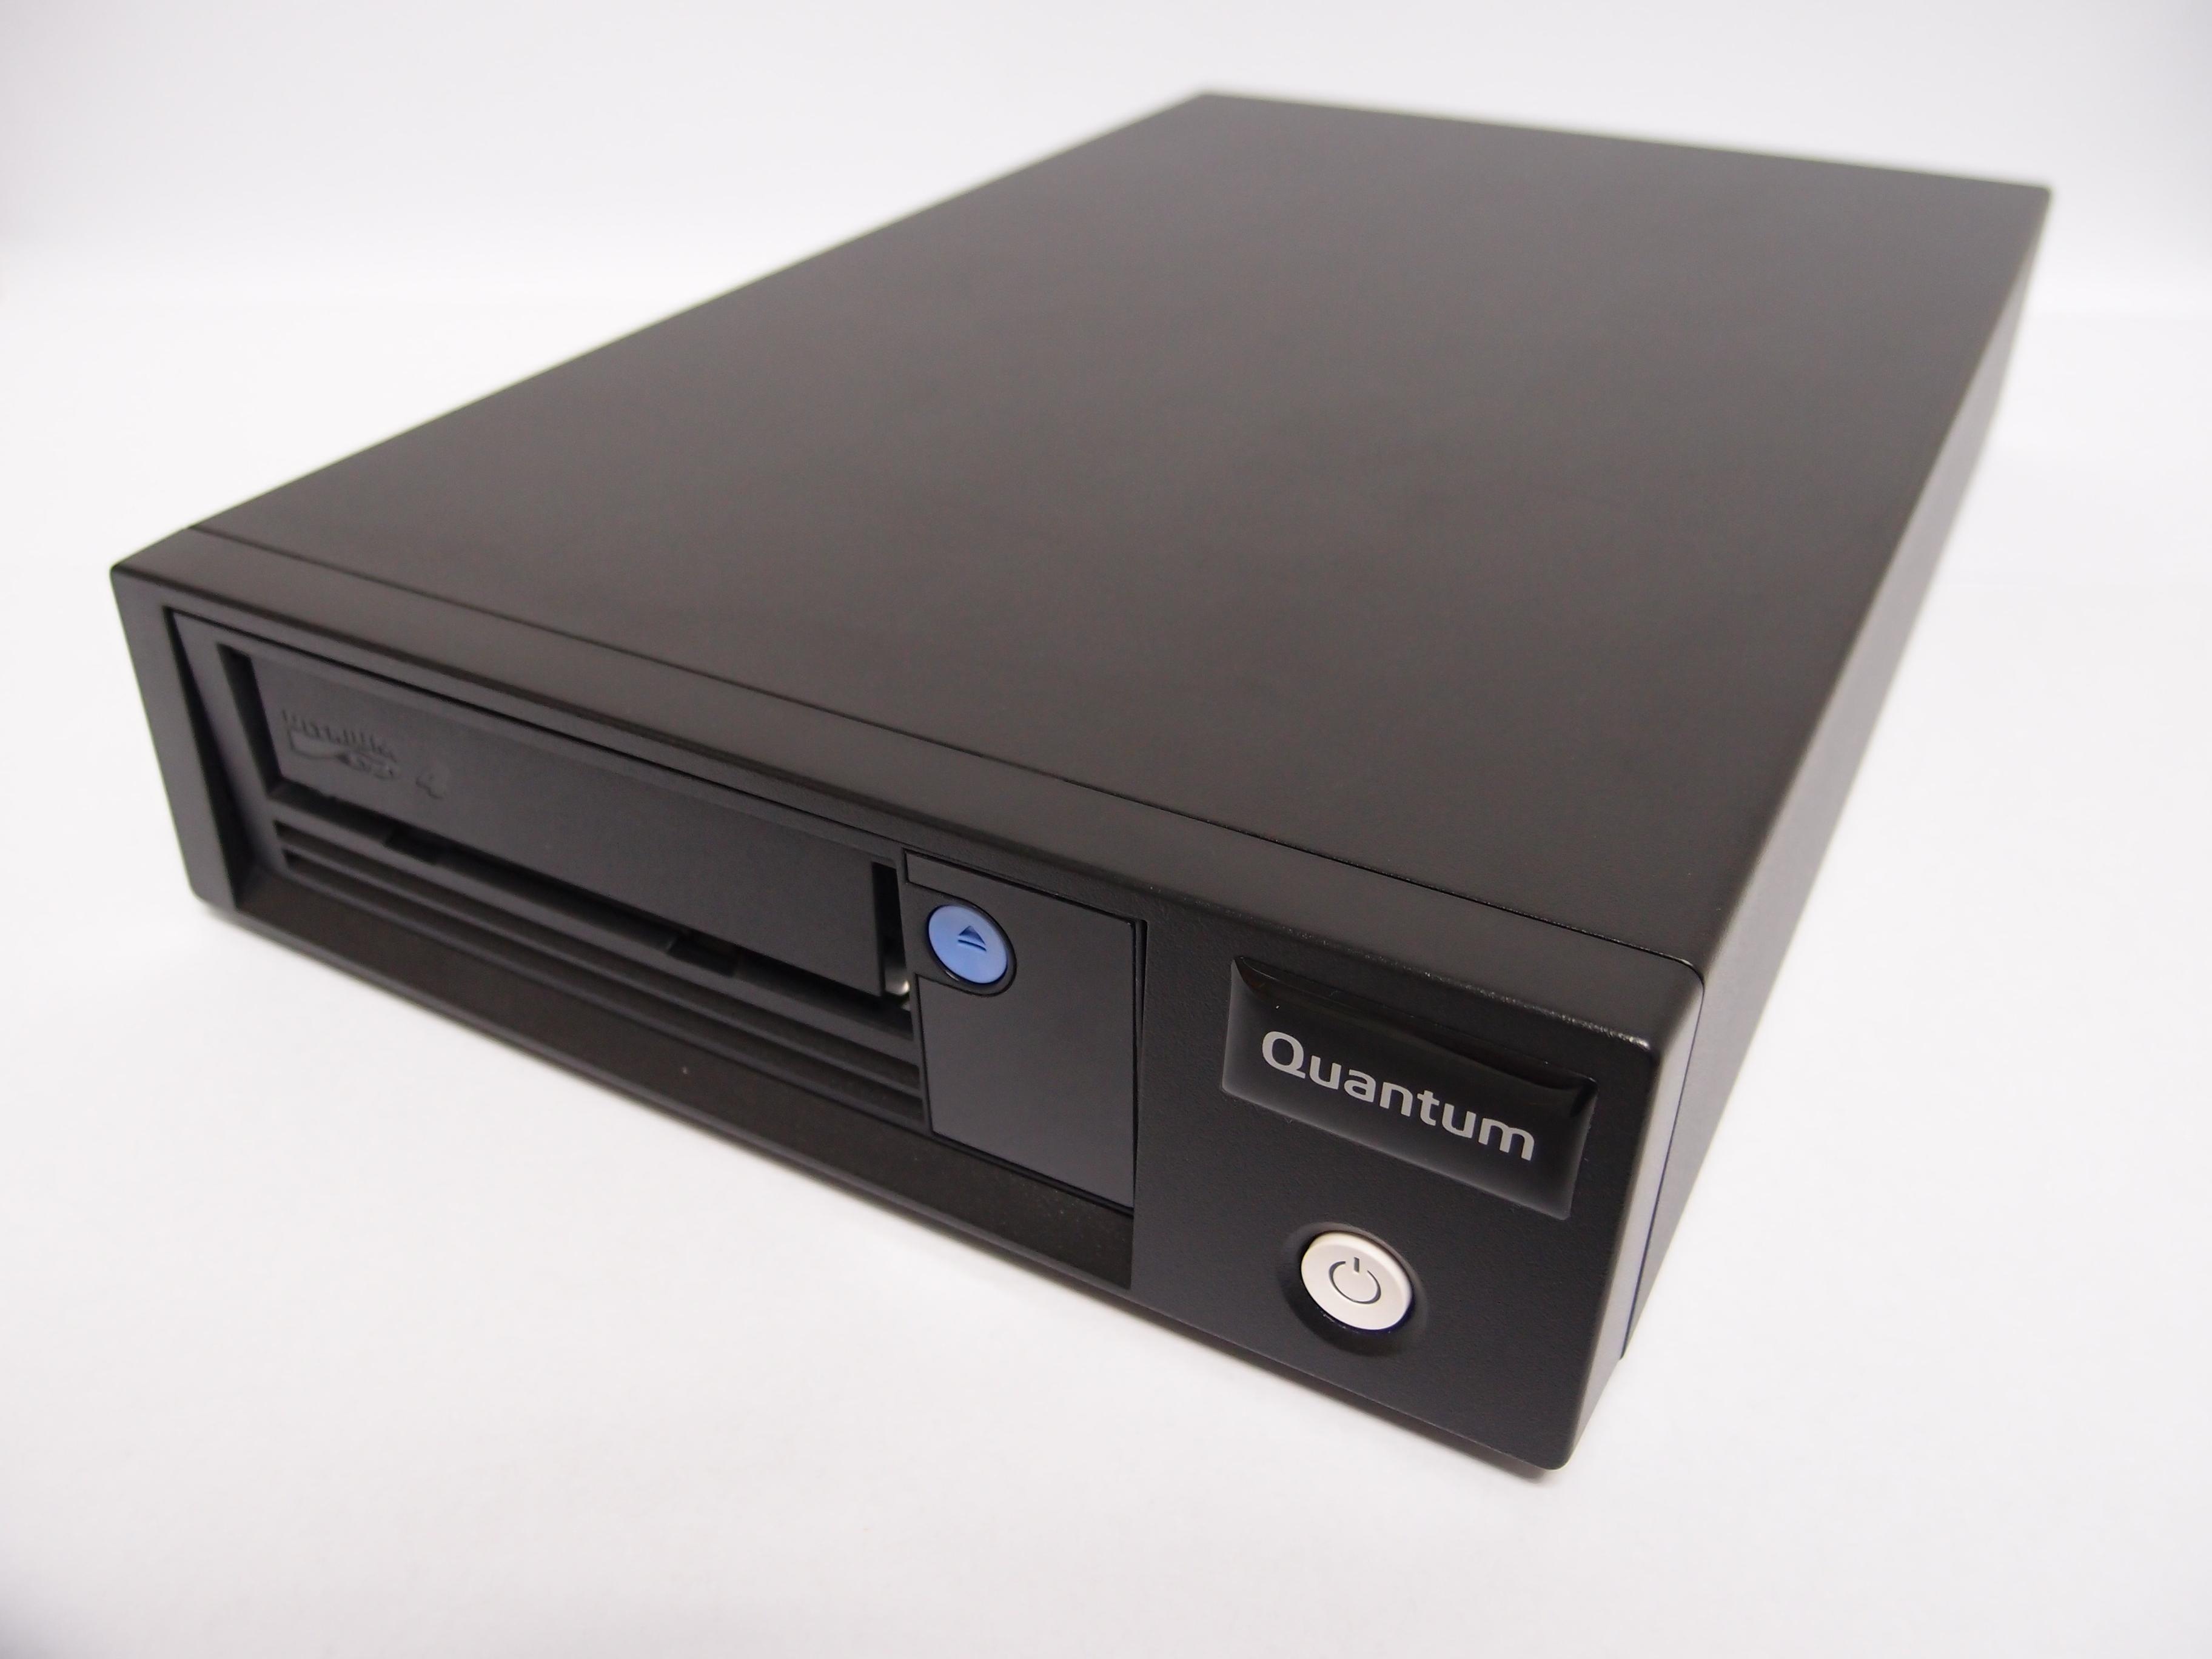 Quantum LTO-4 HH Tape Drive